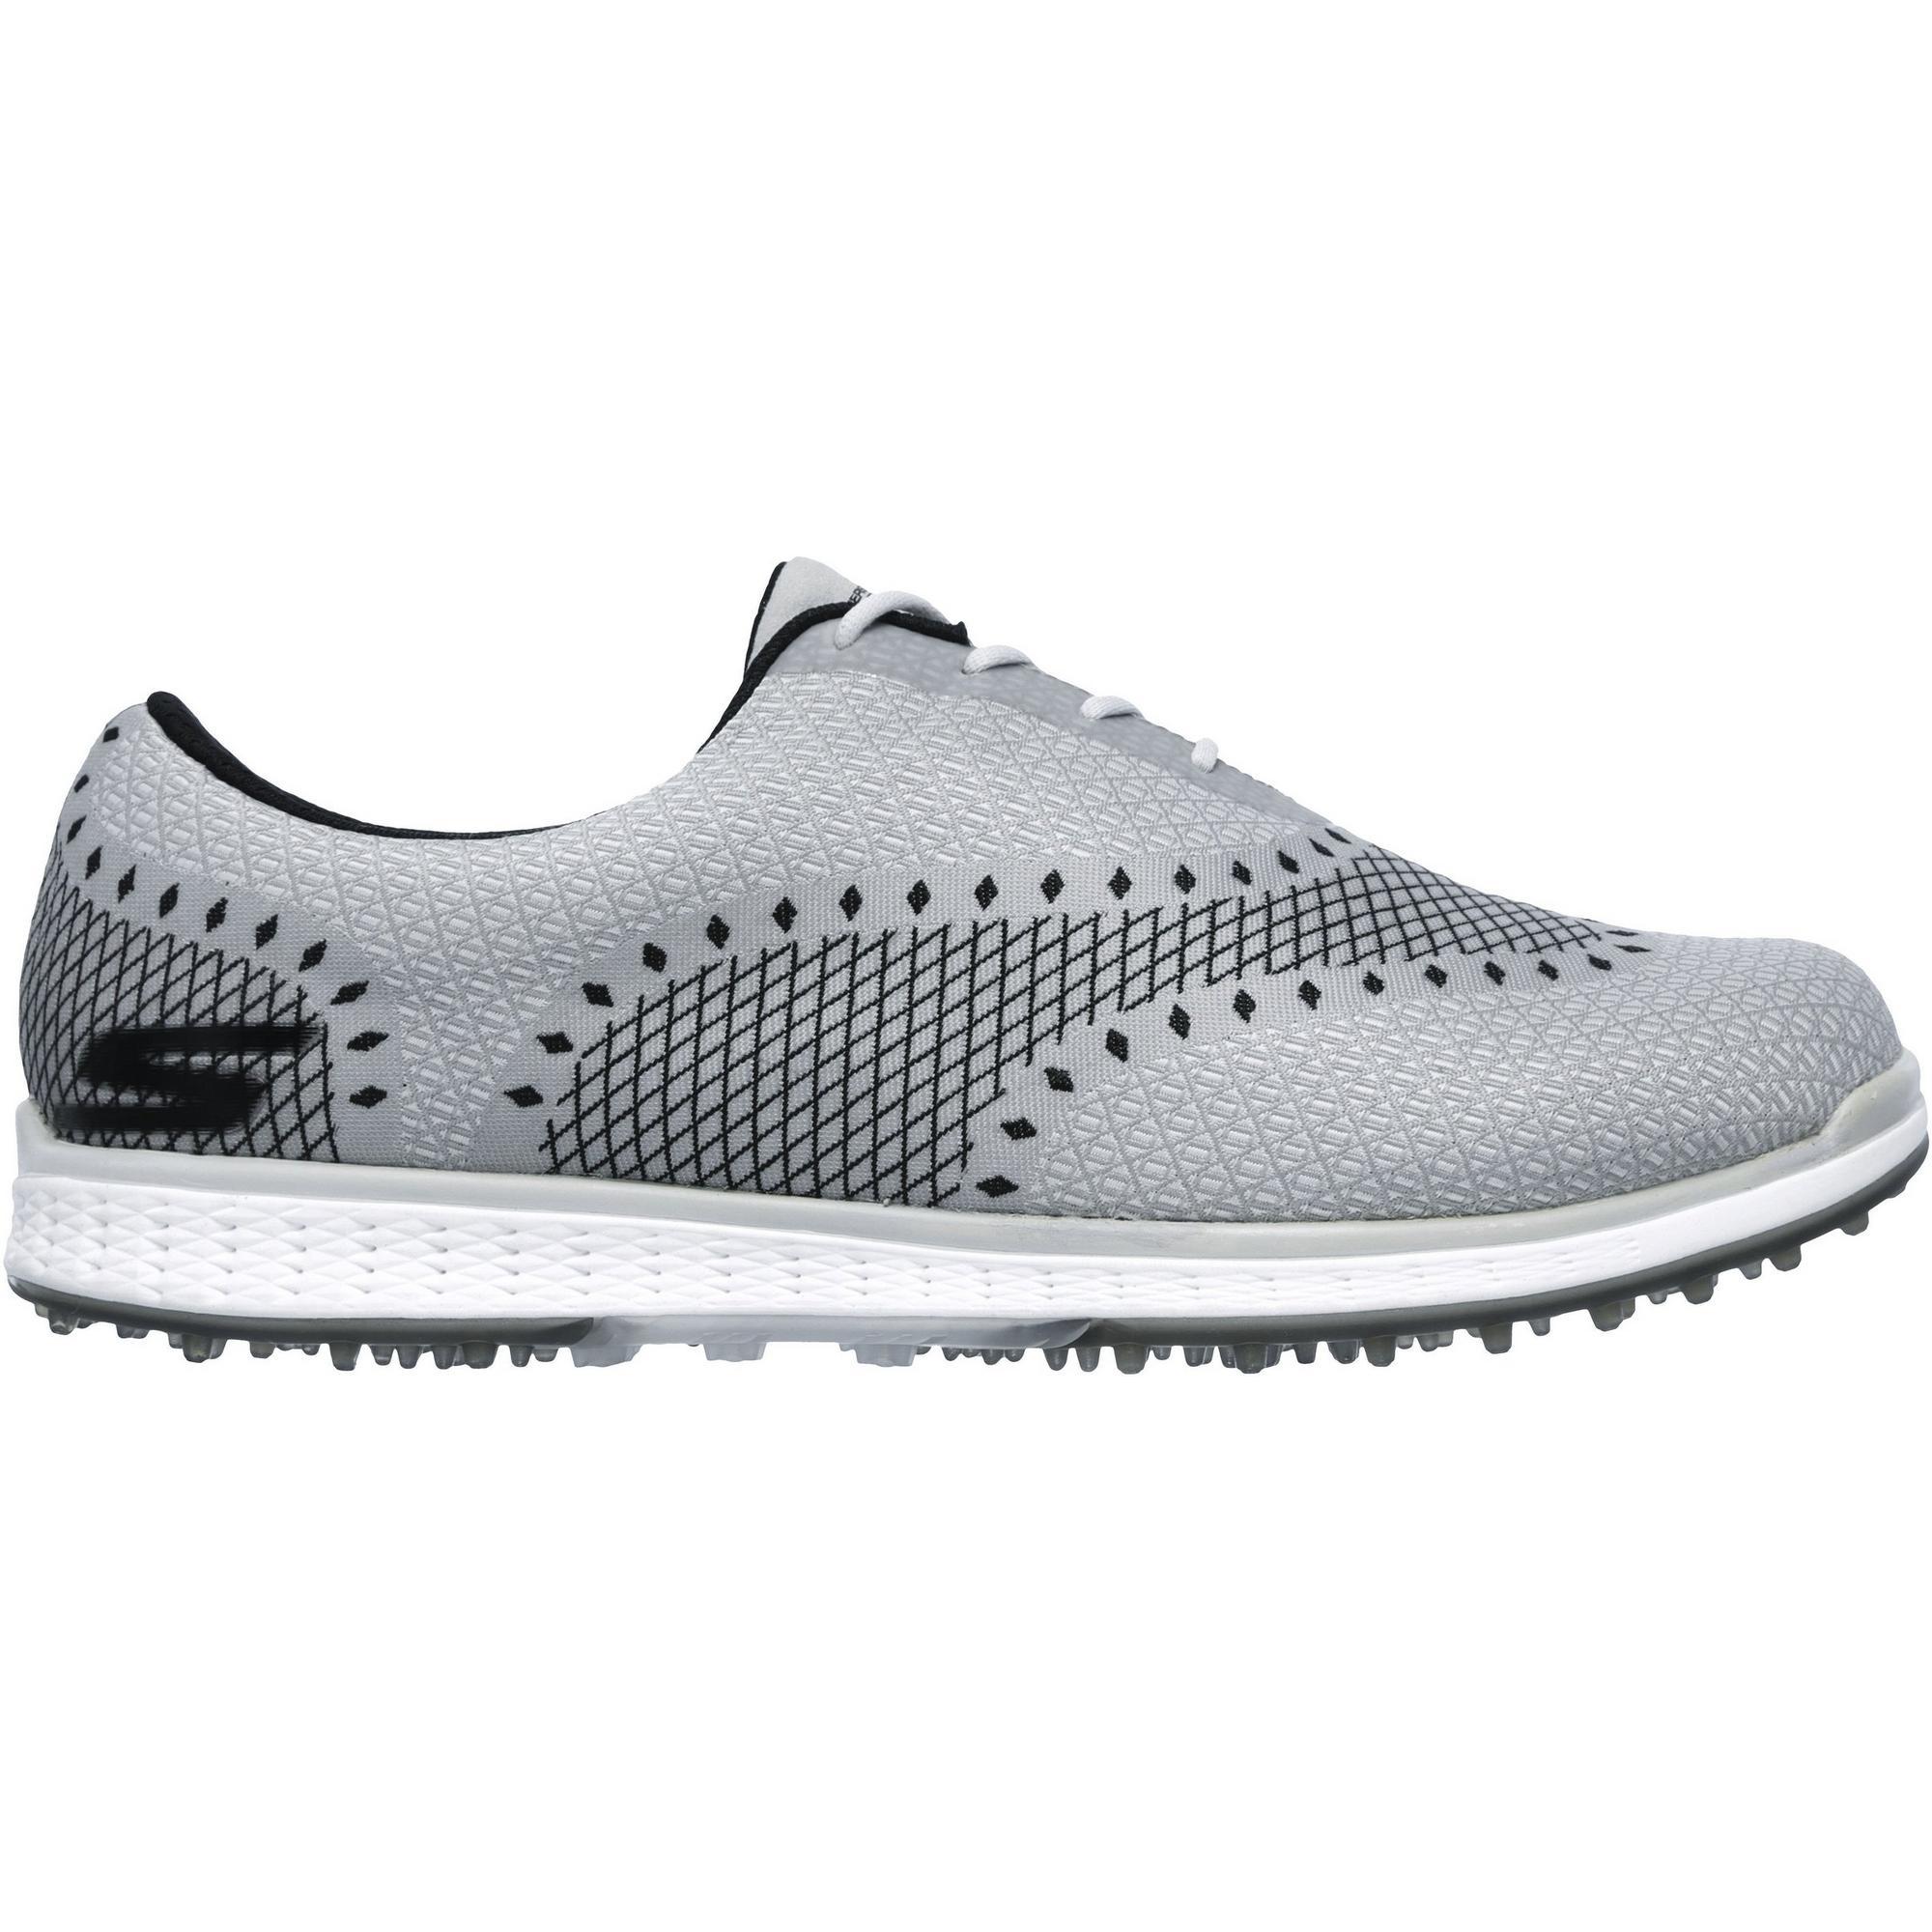 Men's Go Golf Elite Ace Spikeless Golf Shoe- LTGRY/BLK